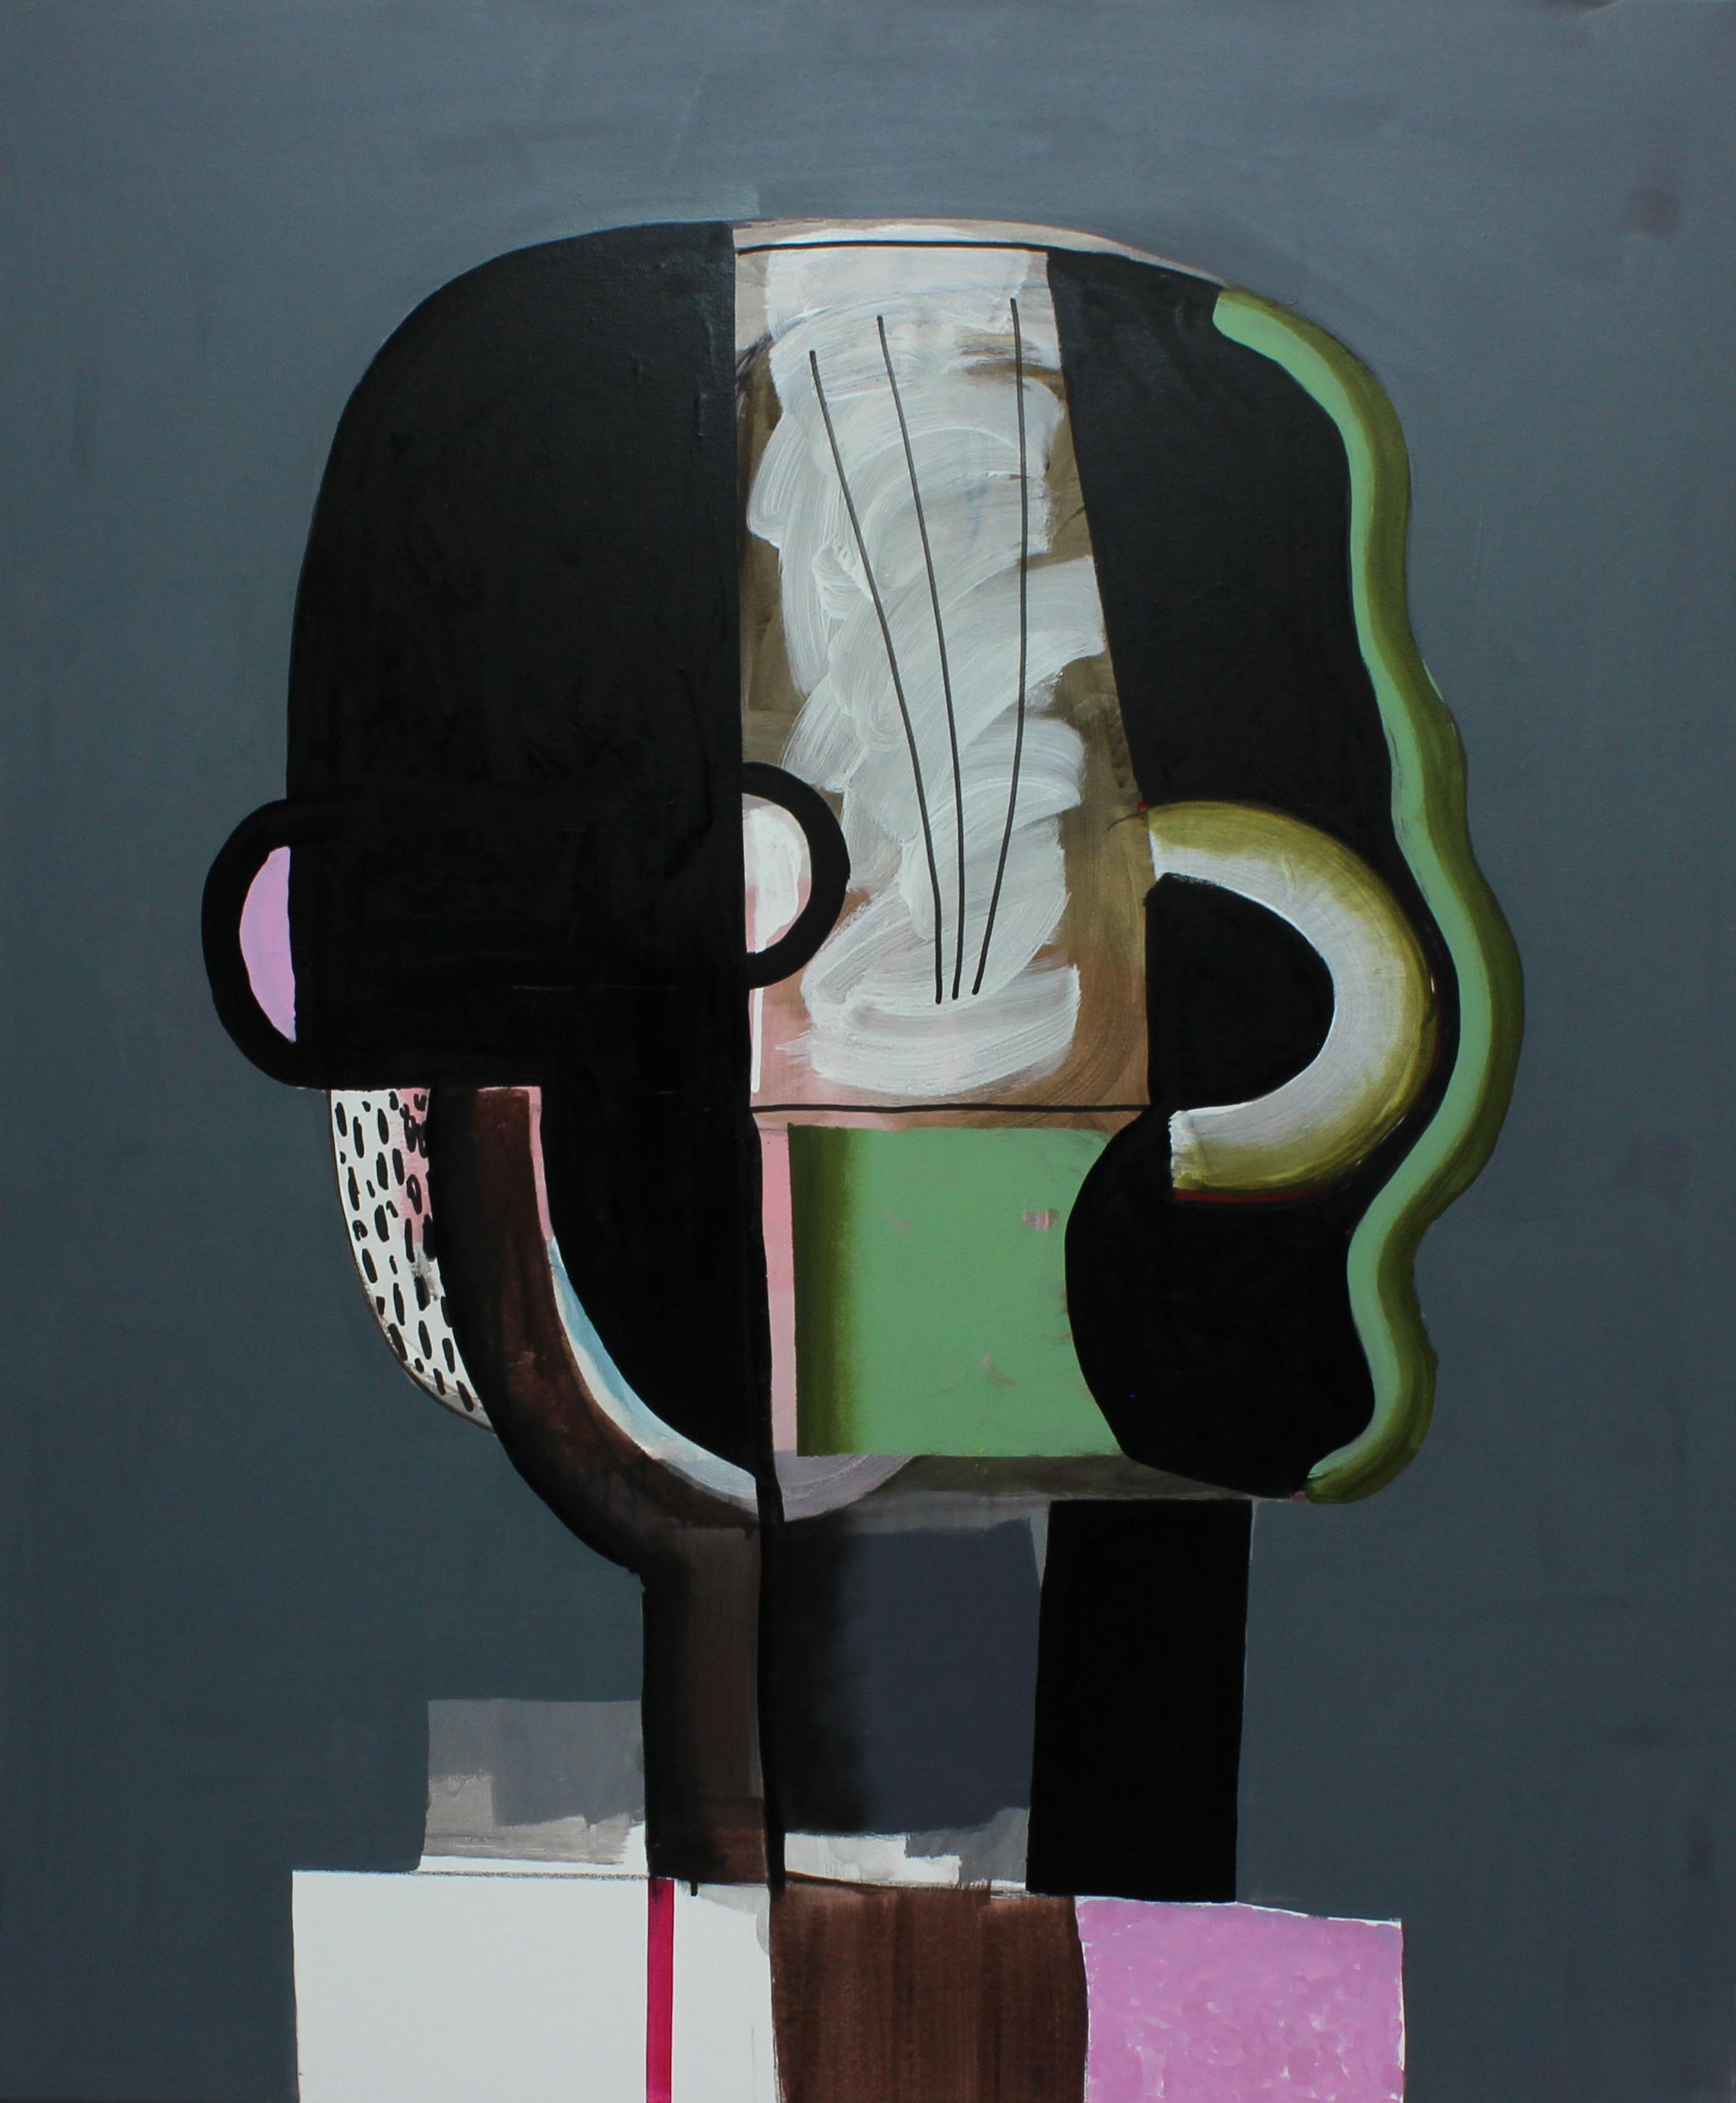 Abb.: Oliver Gröne, Head full of steam, 2019, Acryl und Öl auf Leinwand, 120 x 100 cm